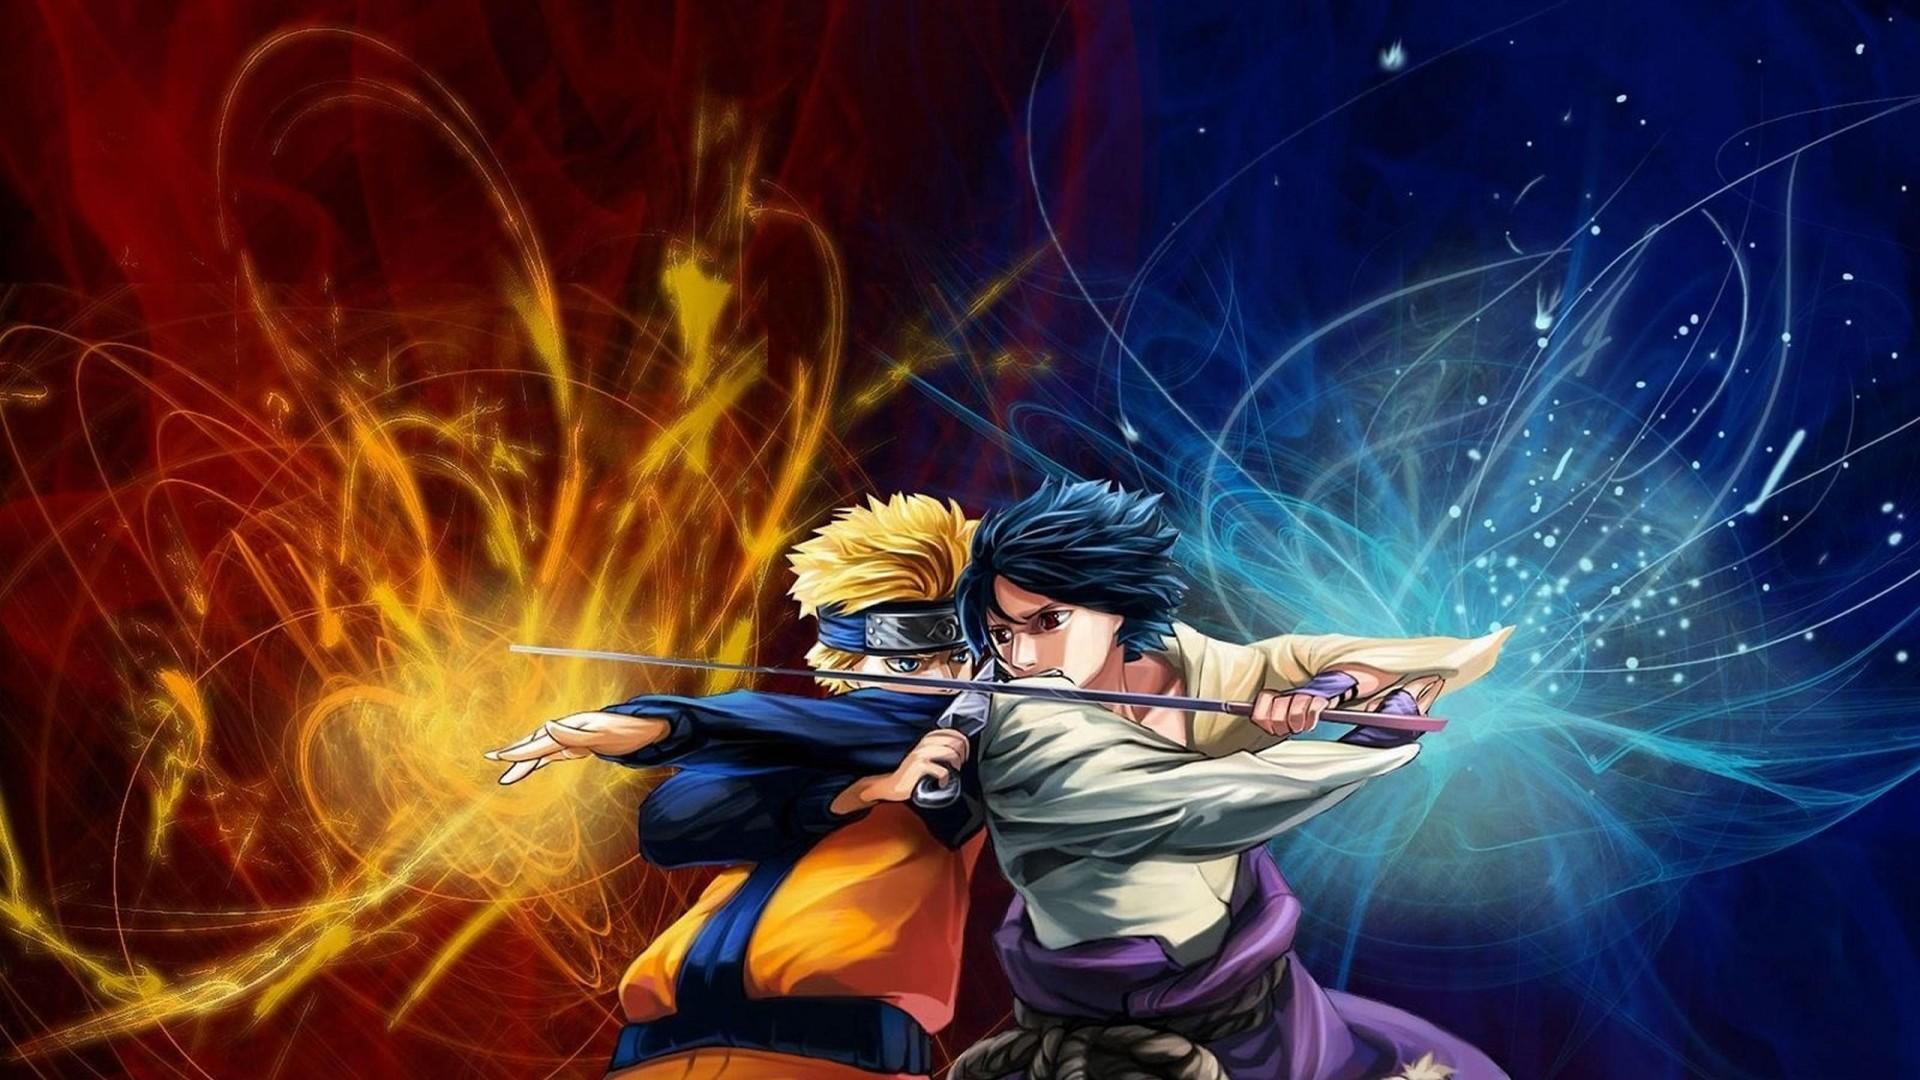 naruto hd wallpaper #647232 - zerochan anime image board